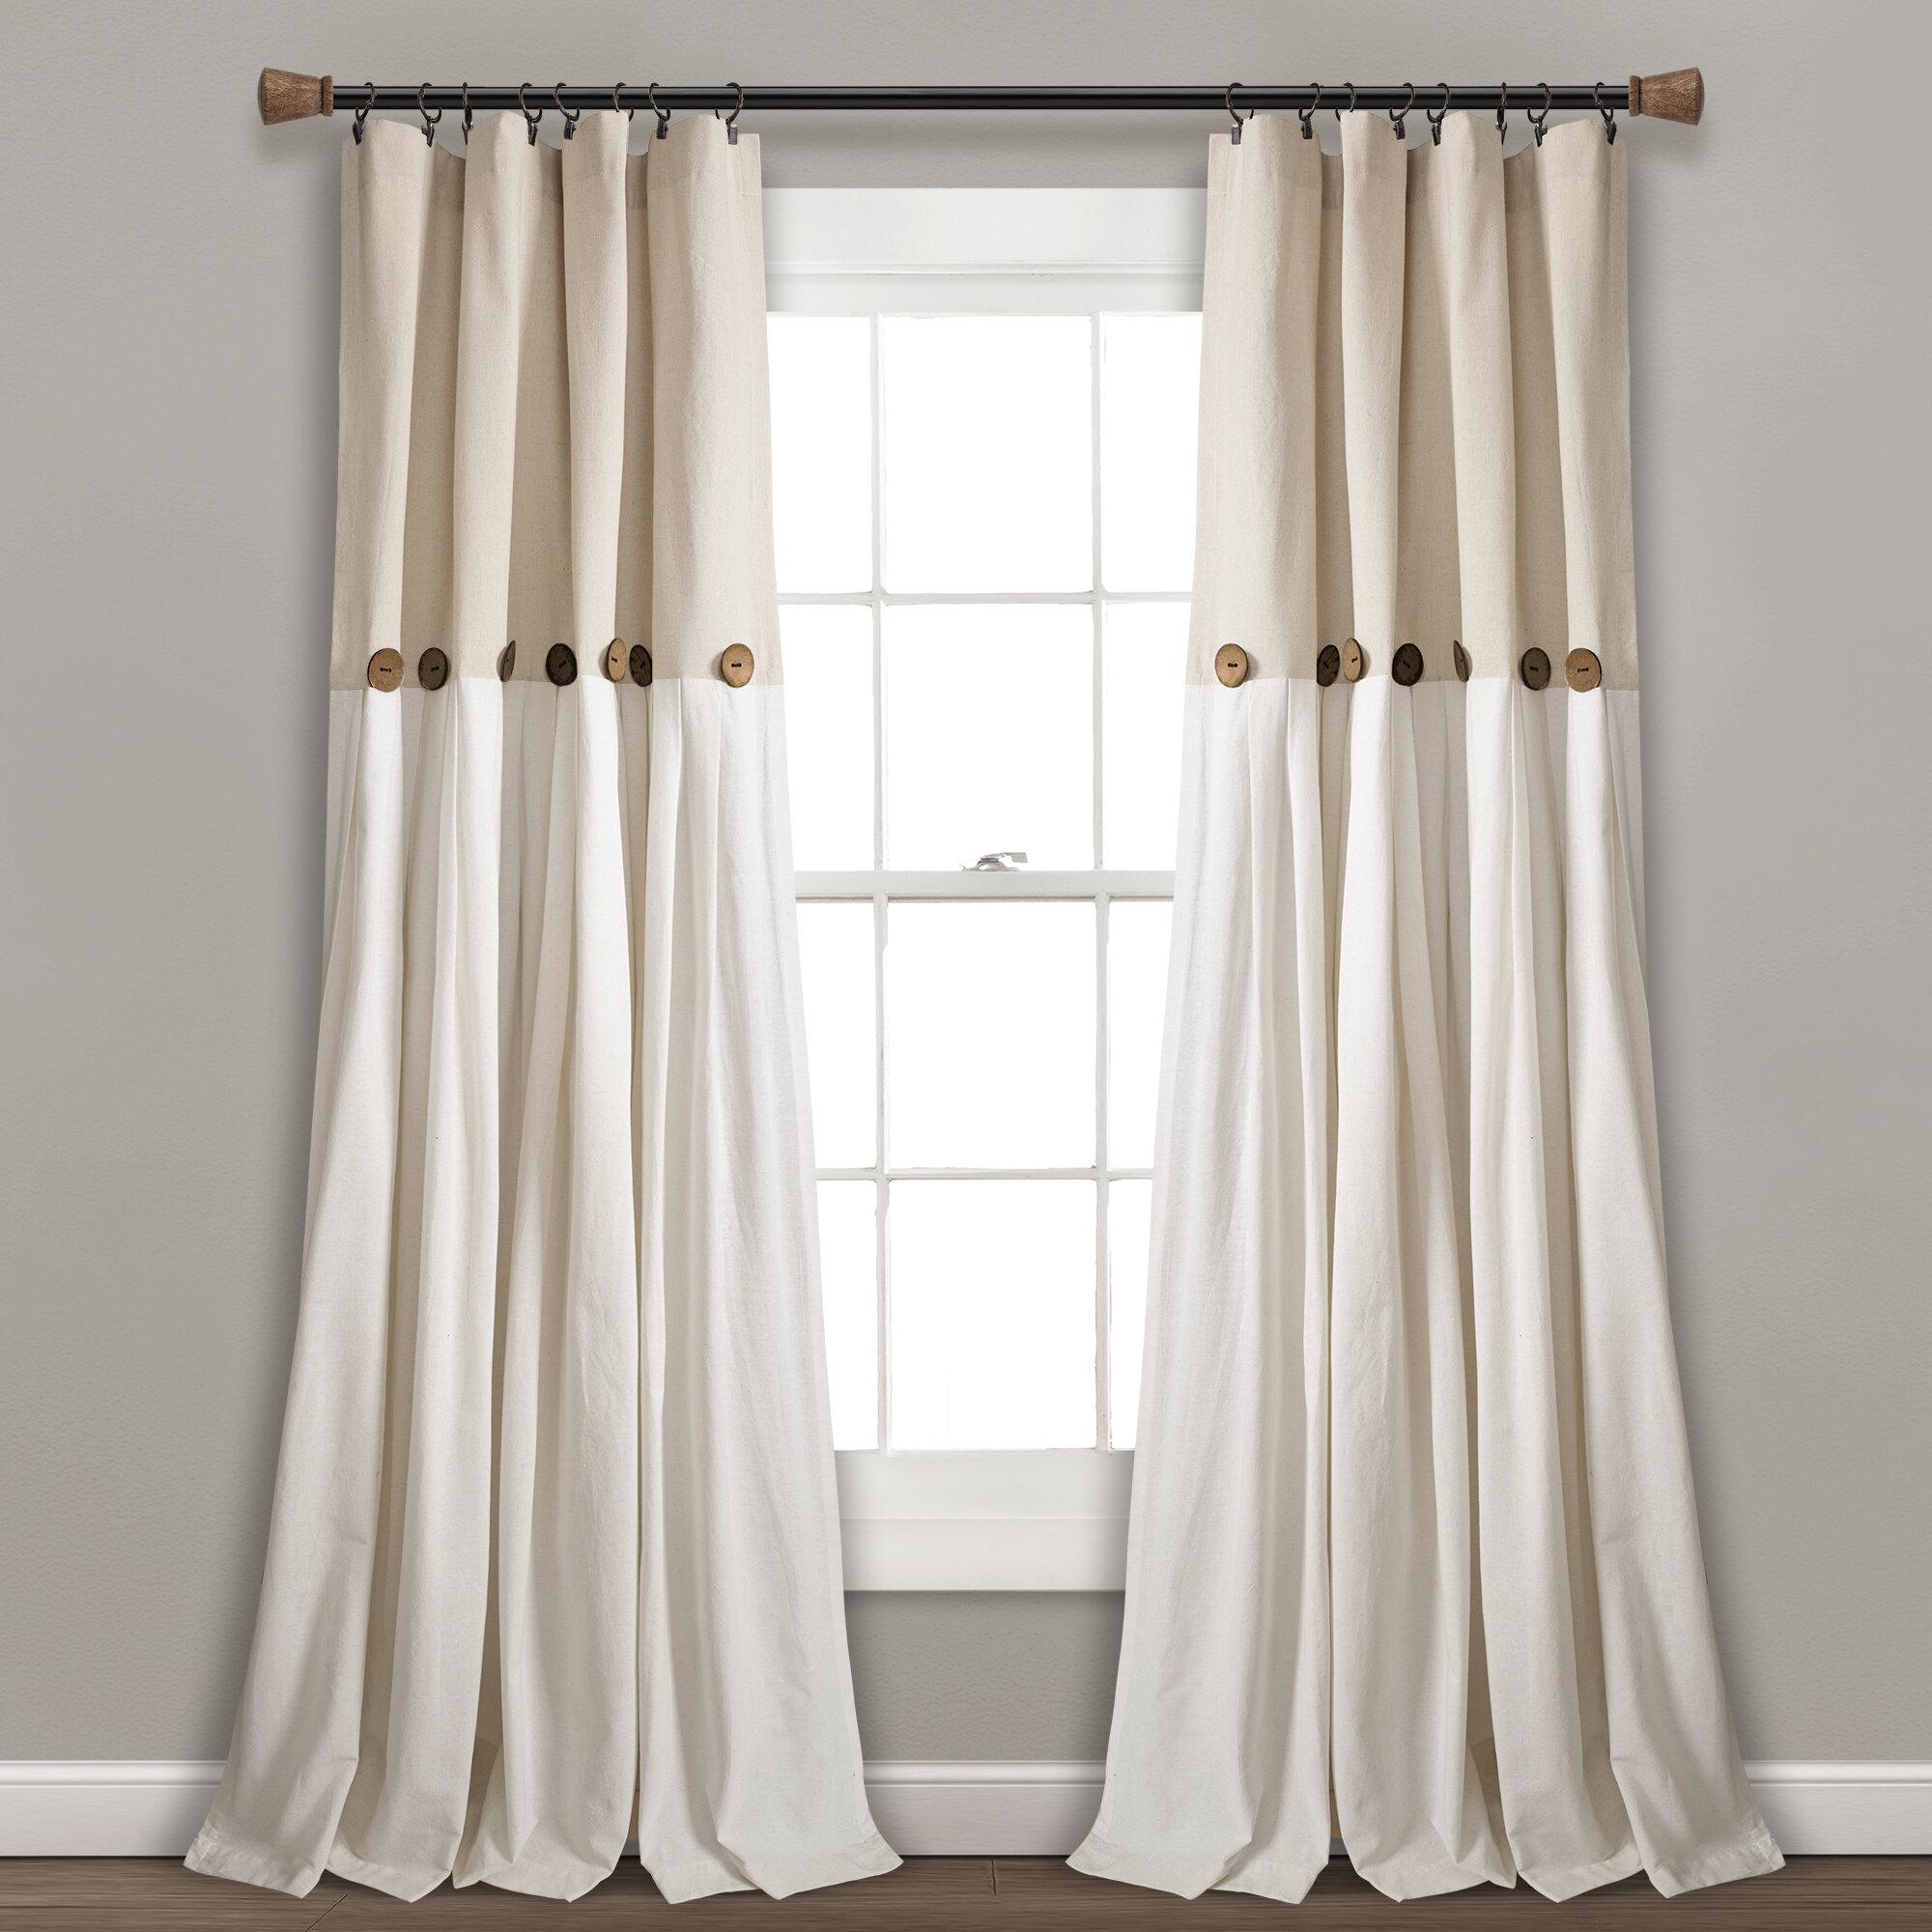 Gracie Oaks Ruya Window Semi Sheer Rod Pocket Single Curtain Panel Reviews Wayfair